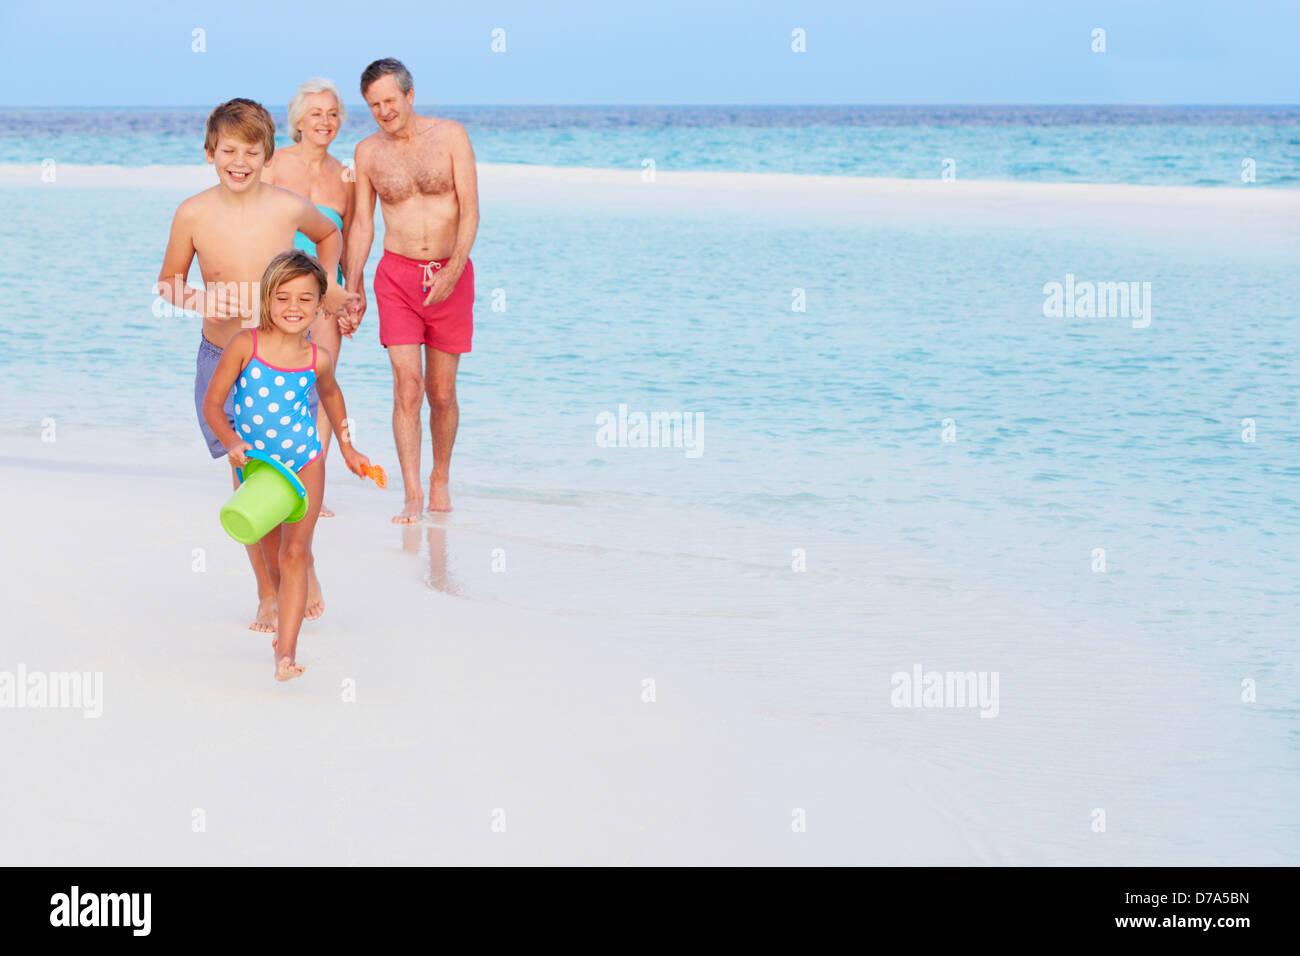 Grandparents And Grandchildren Having Fun On Beach Holiday Stock Photo